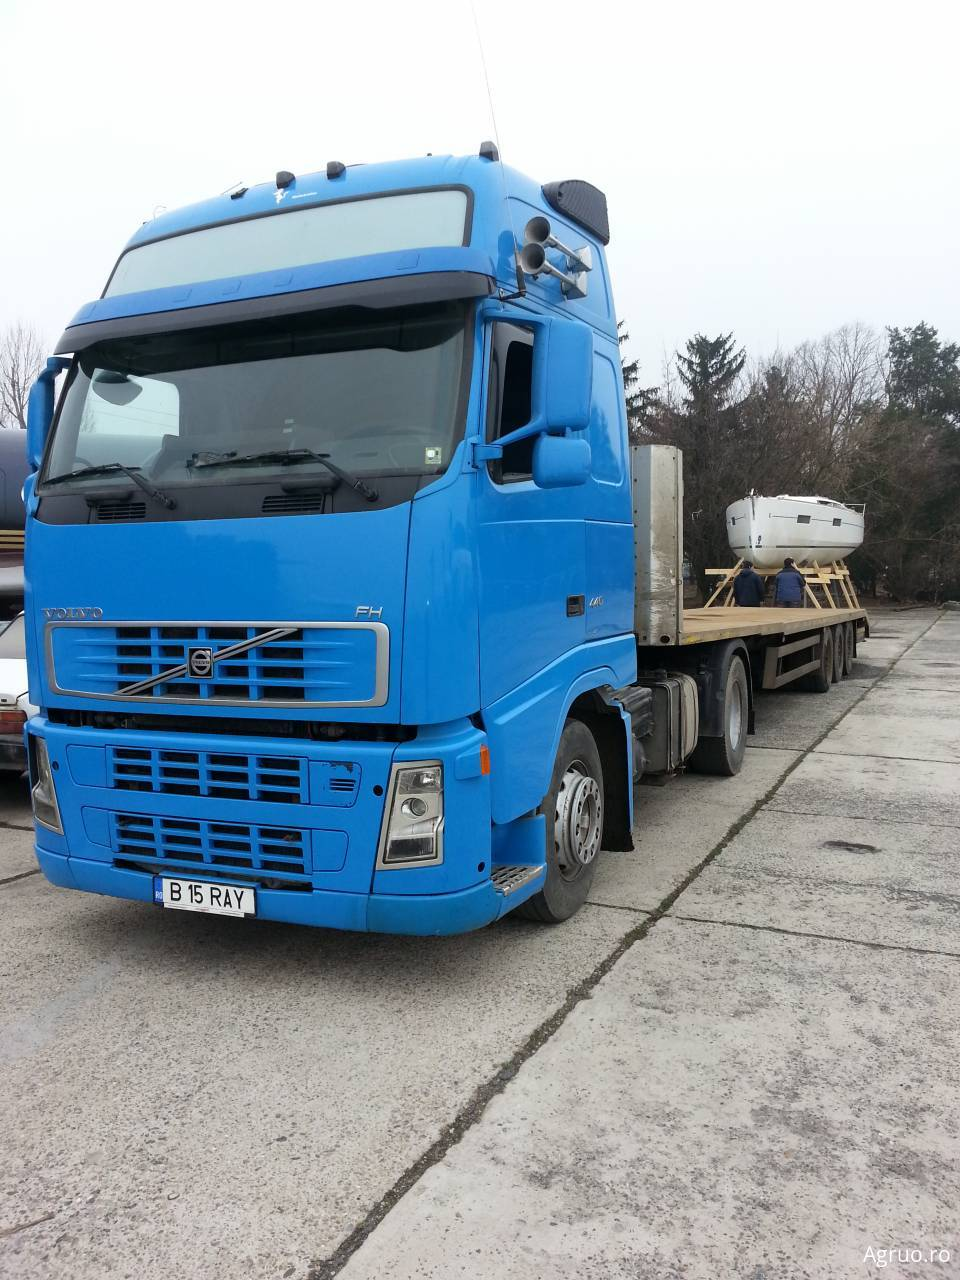 Camion cu platforma51237